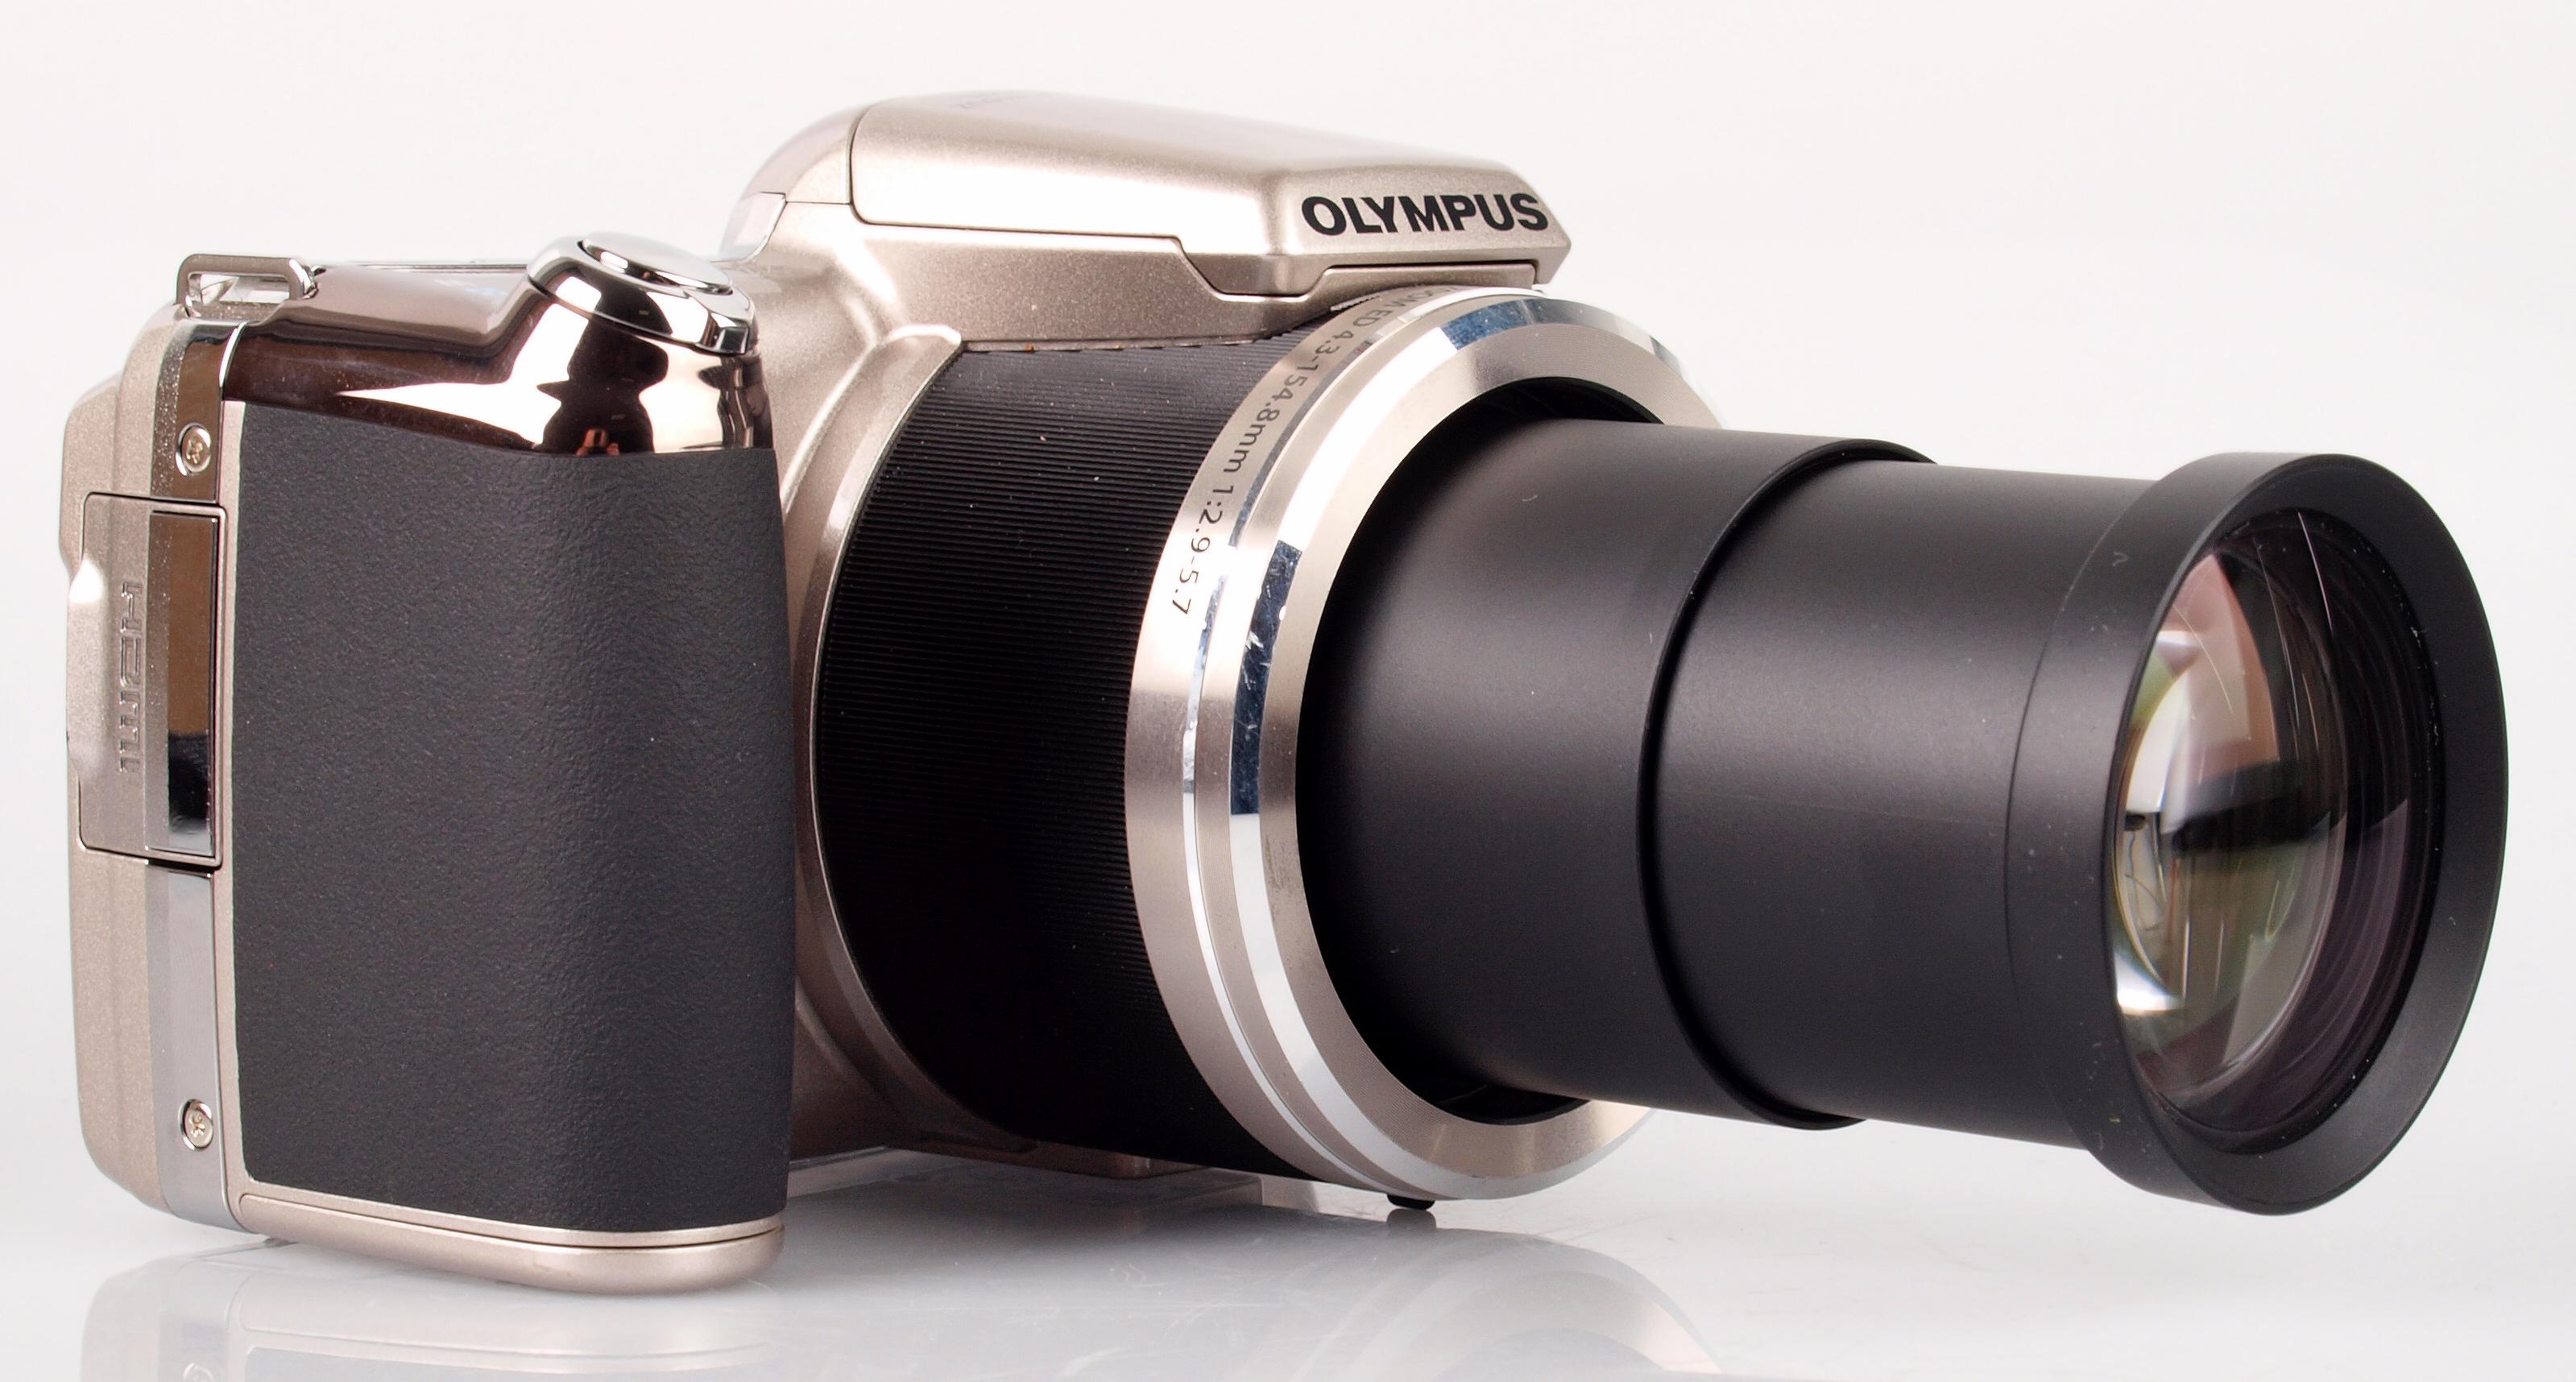 olympus sp 810uz compact digital camera review rh ephotozine com olympus camera sp-810uz manual olympus camera sp-810uz price